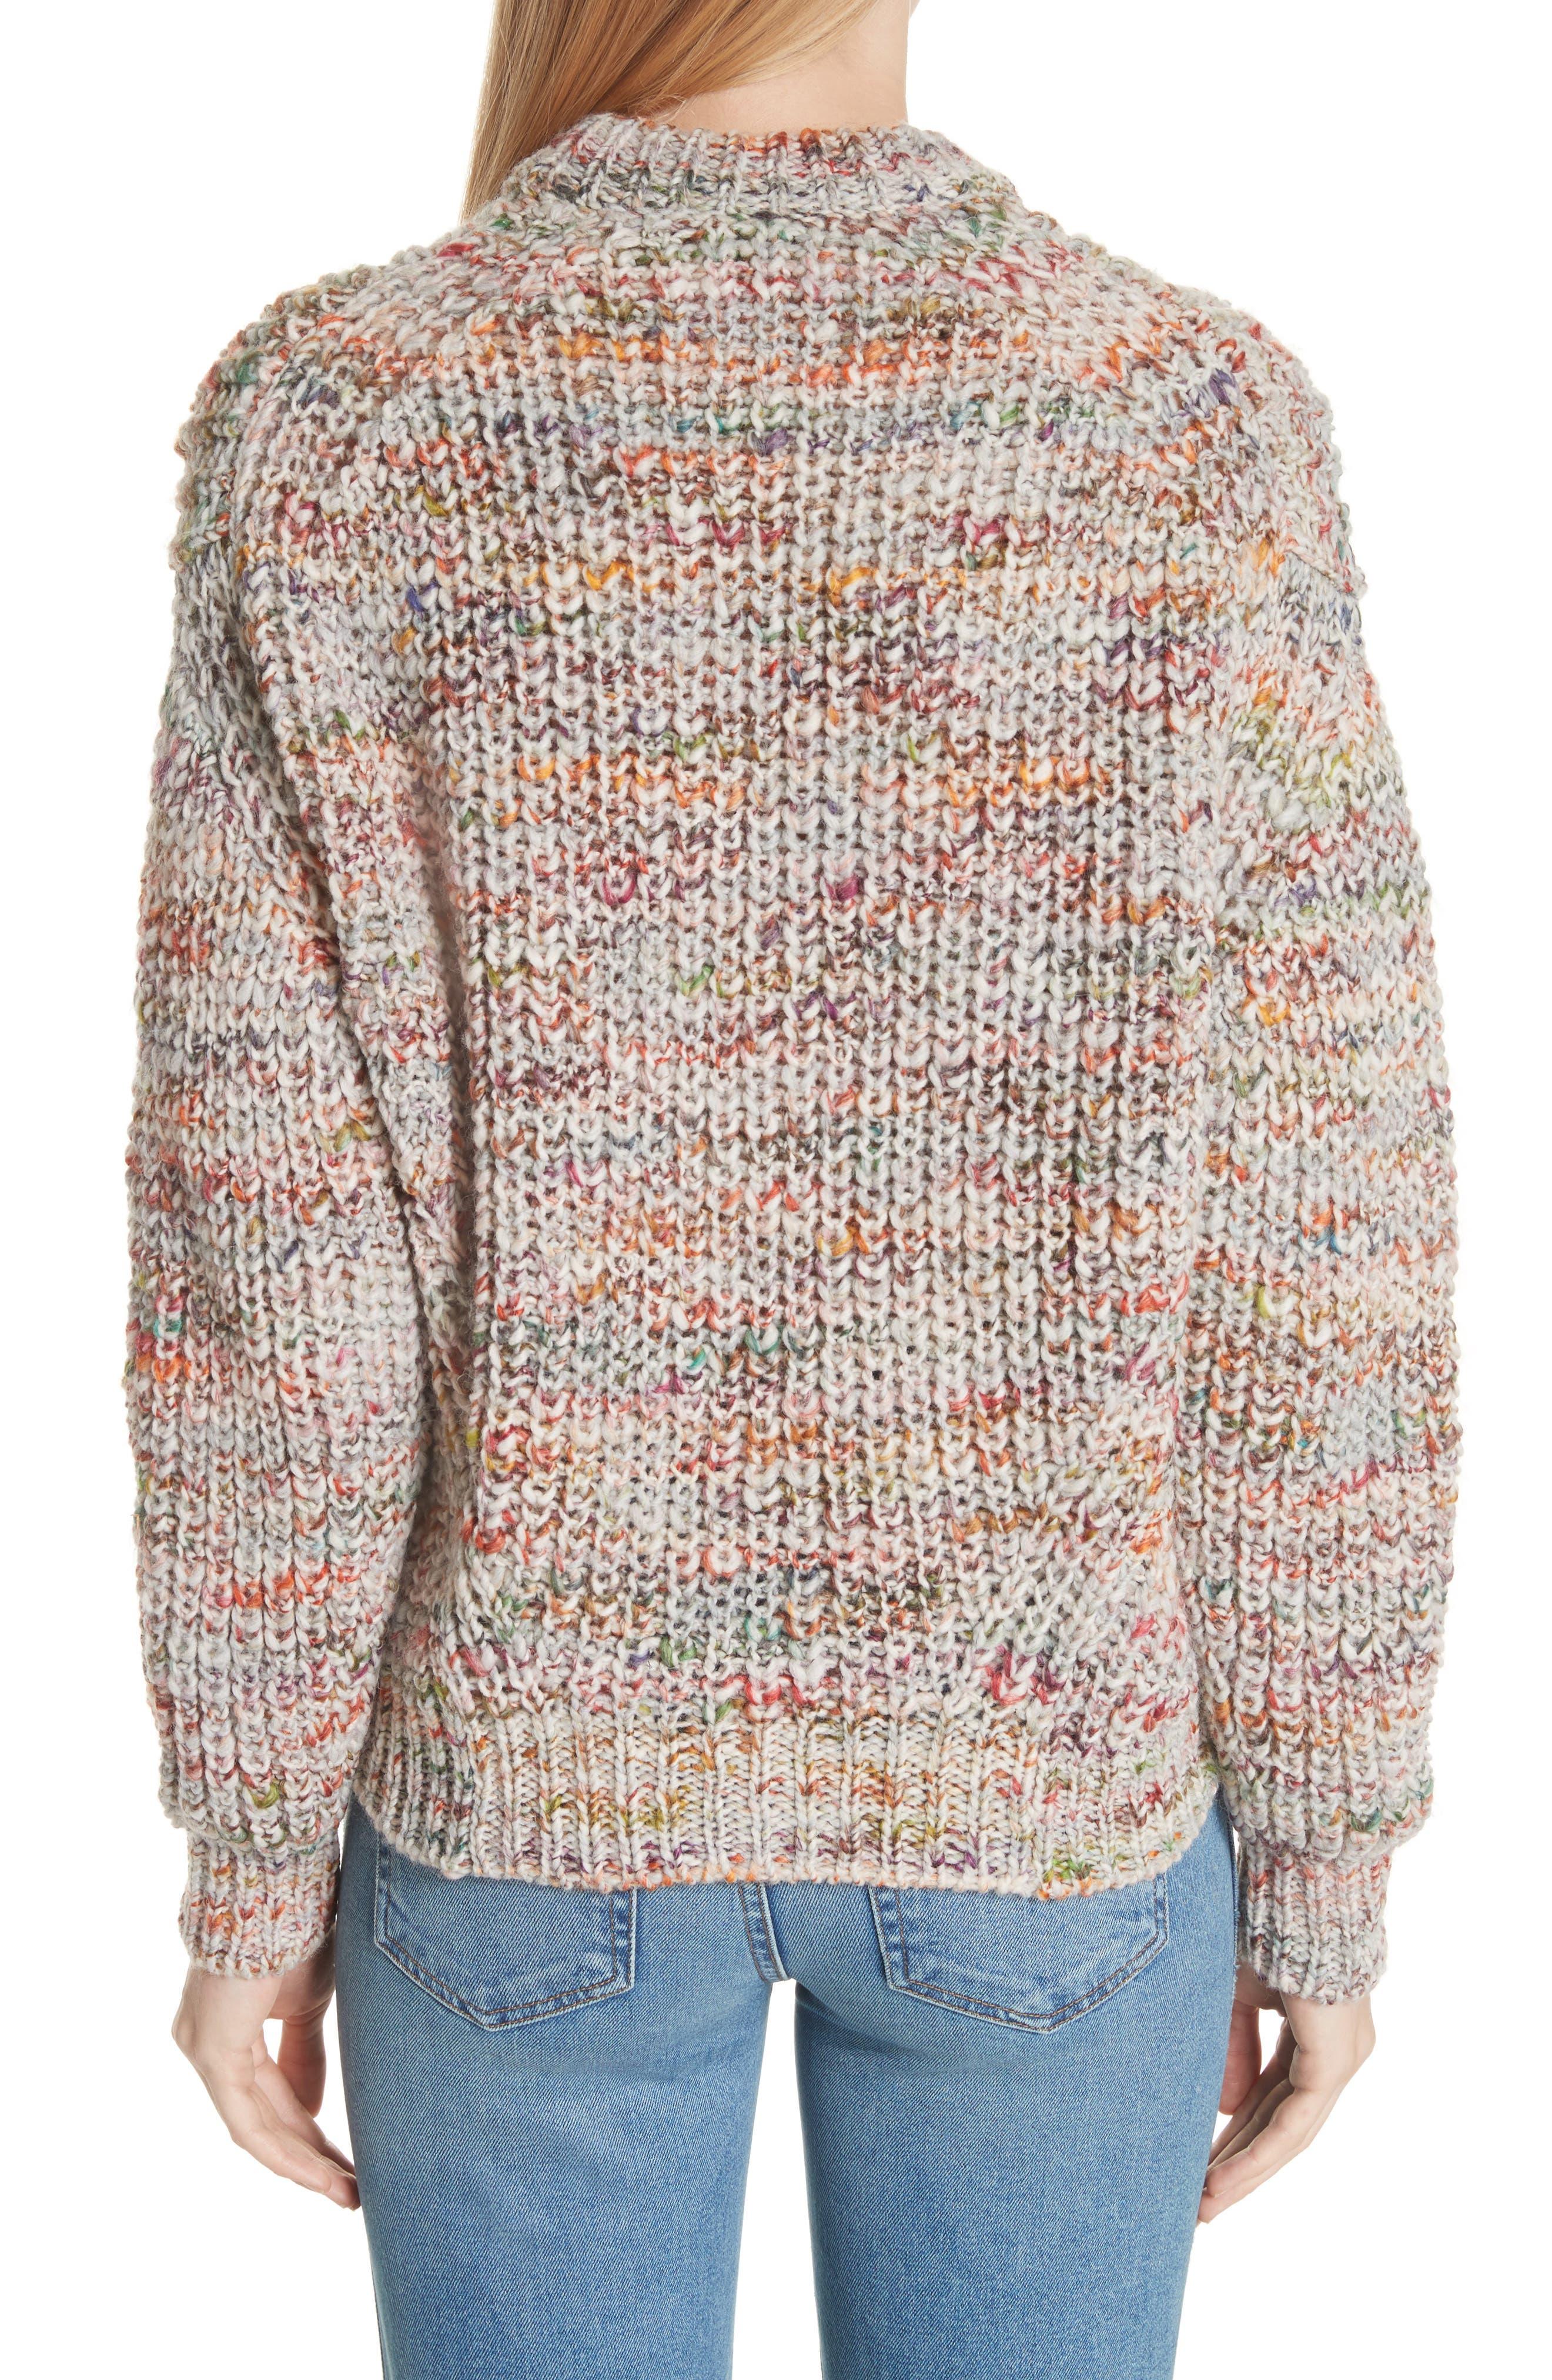 Zora Multi Sweater,                             Alternate thumbnail 2, color,                             100